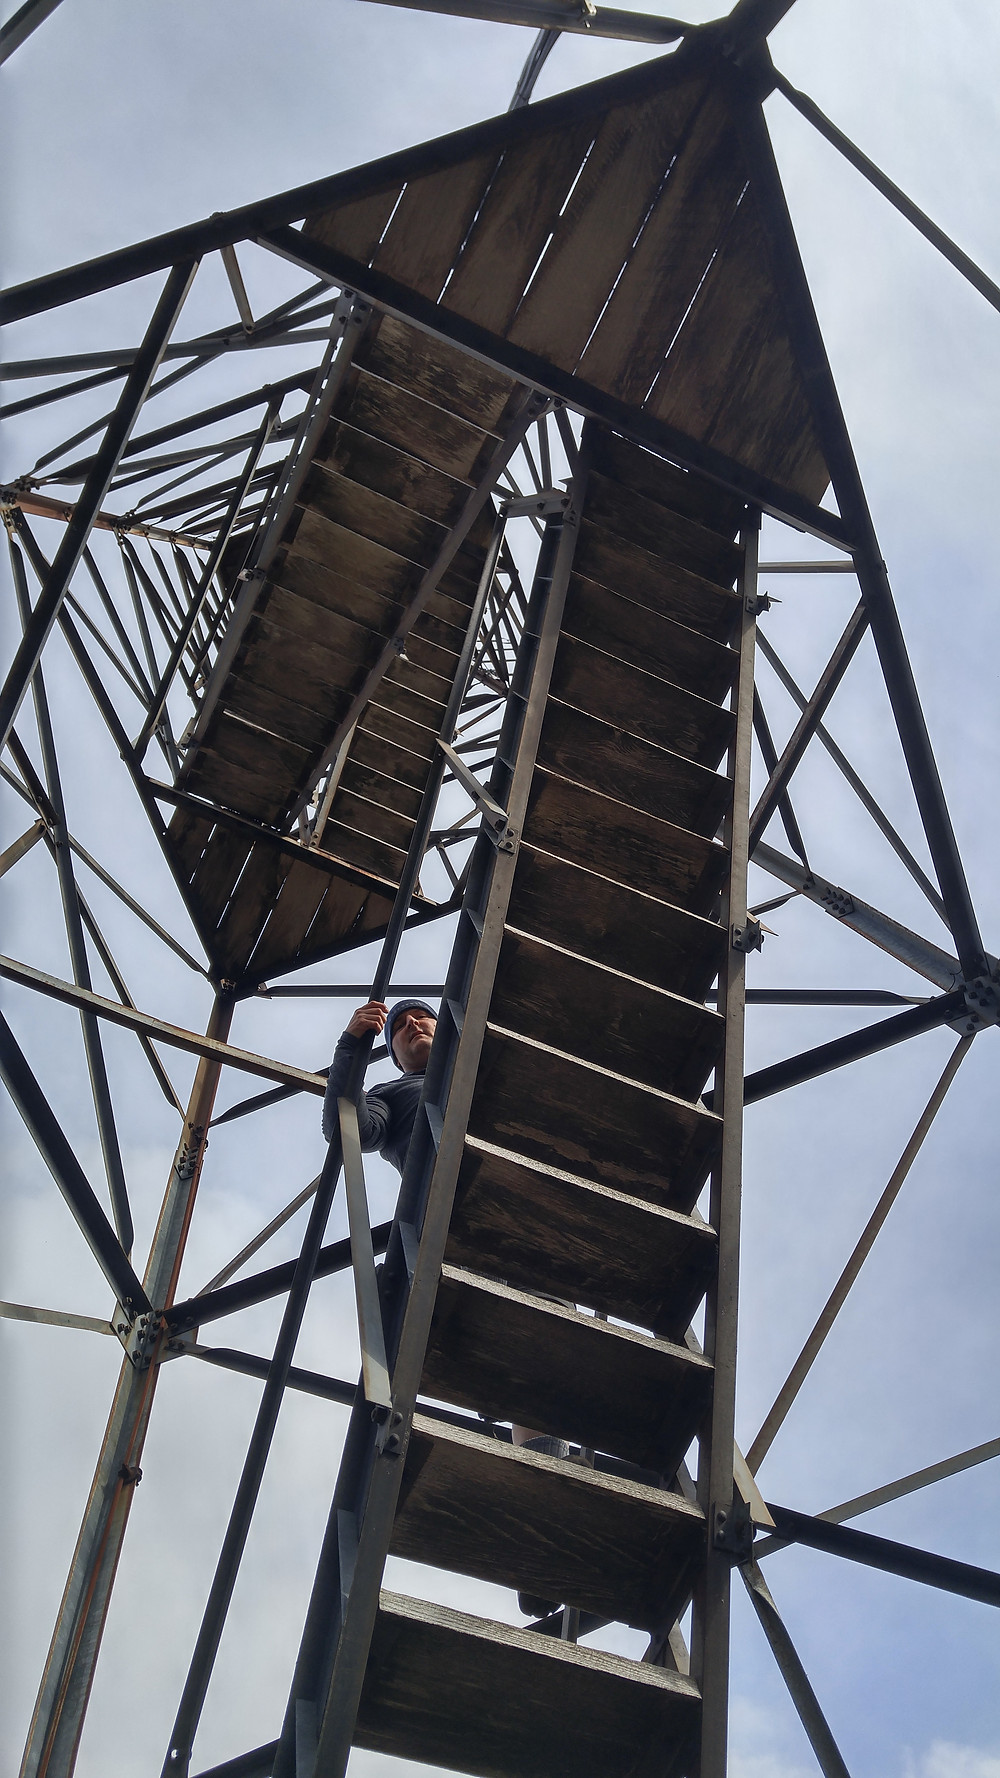 Daniel climbing the (sketchy!) firetower